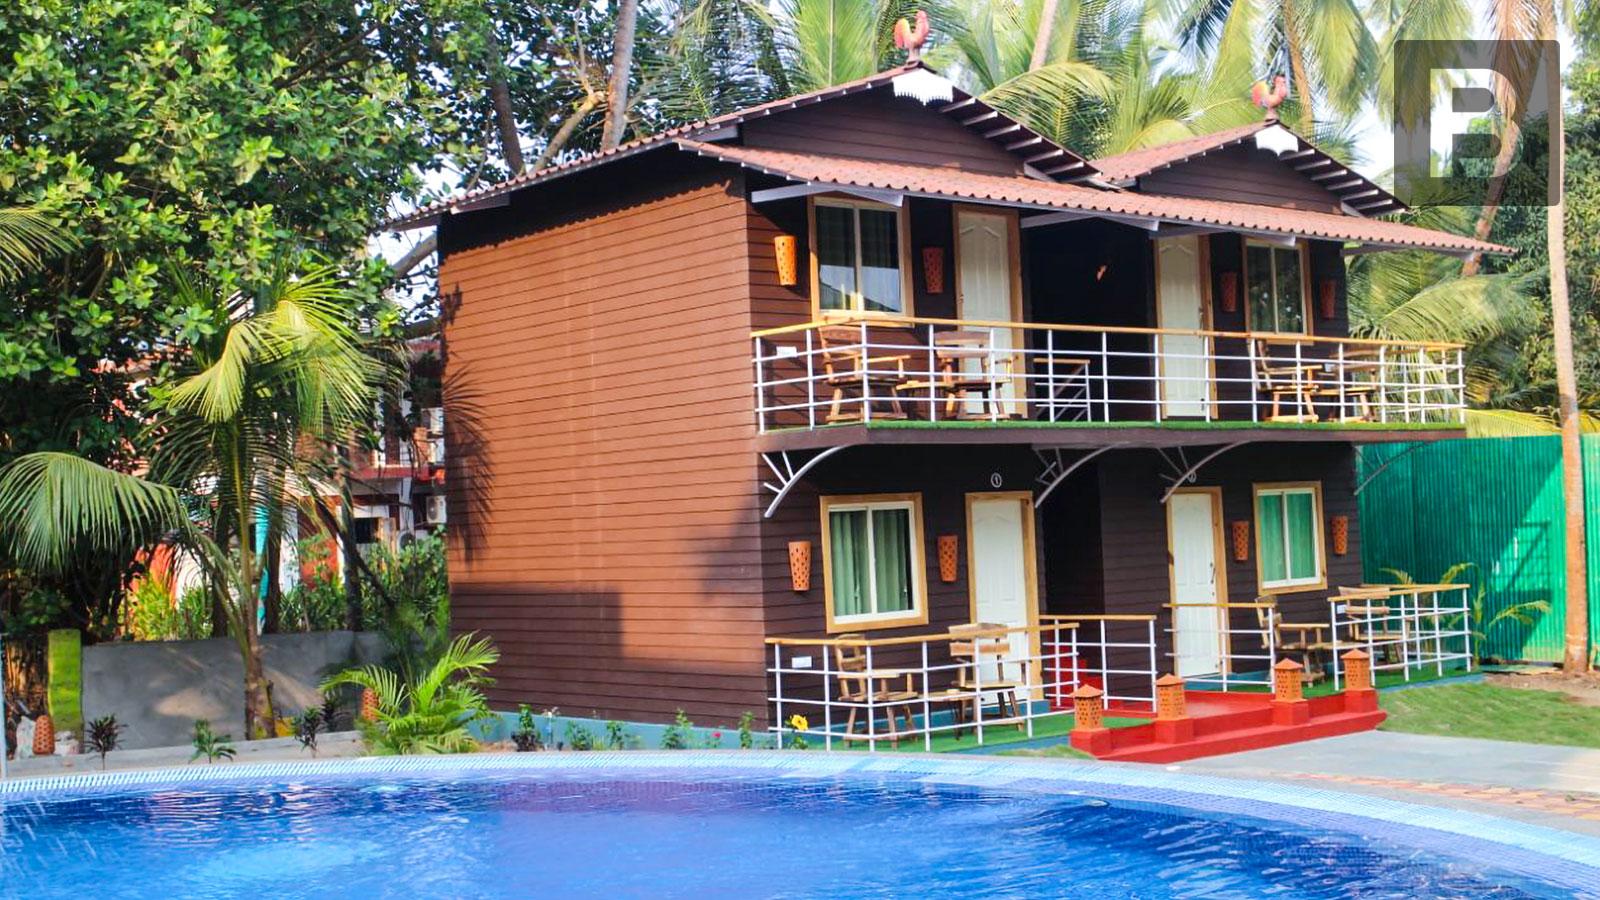 Beyond Stay Gulmohar Cottages, Goa